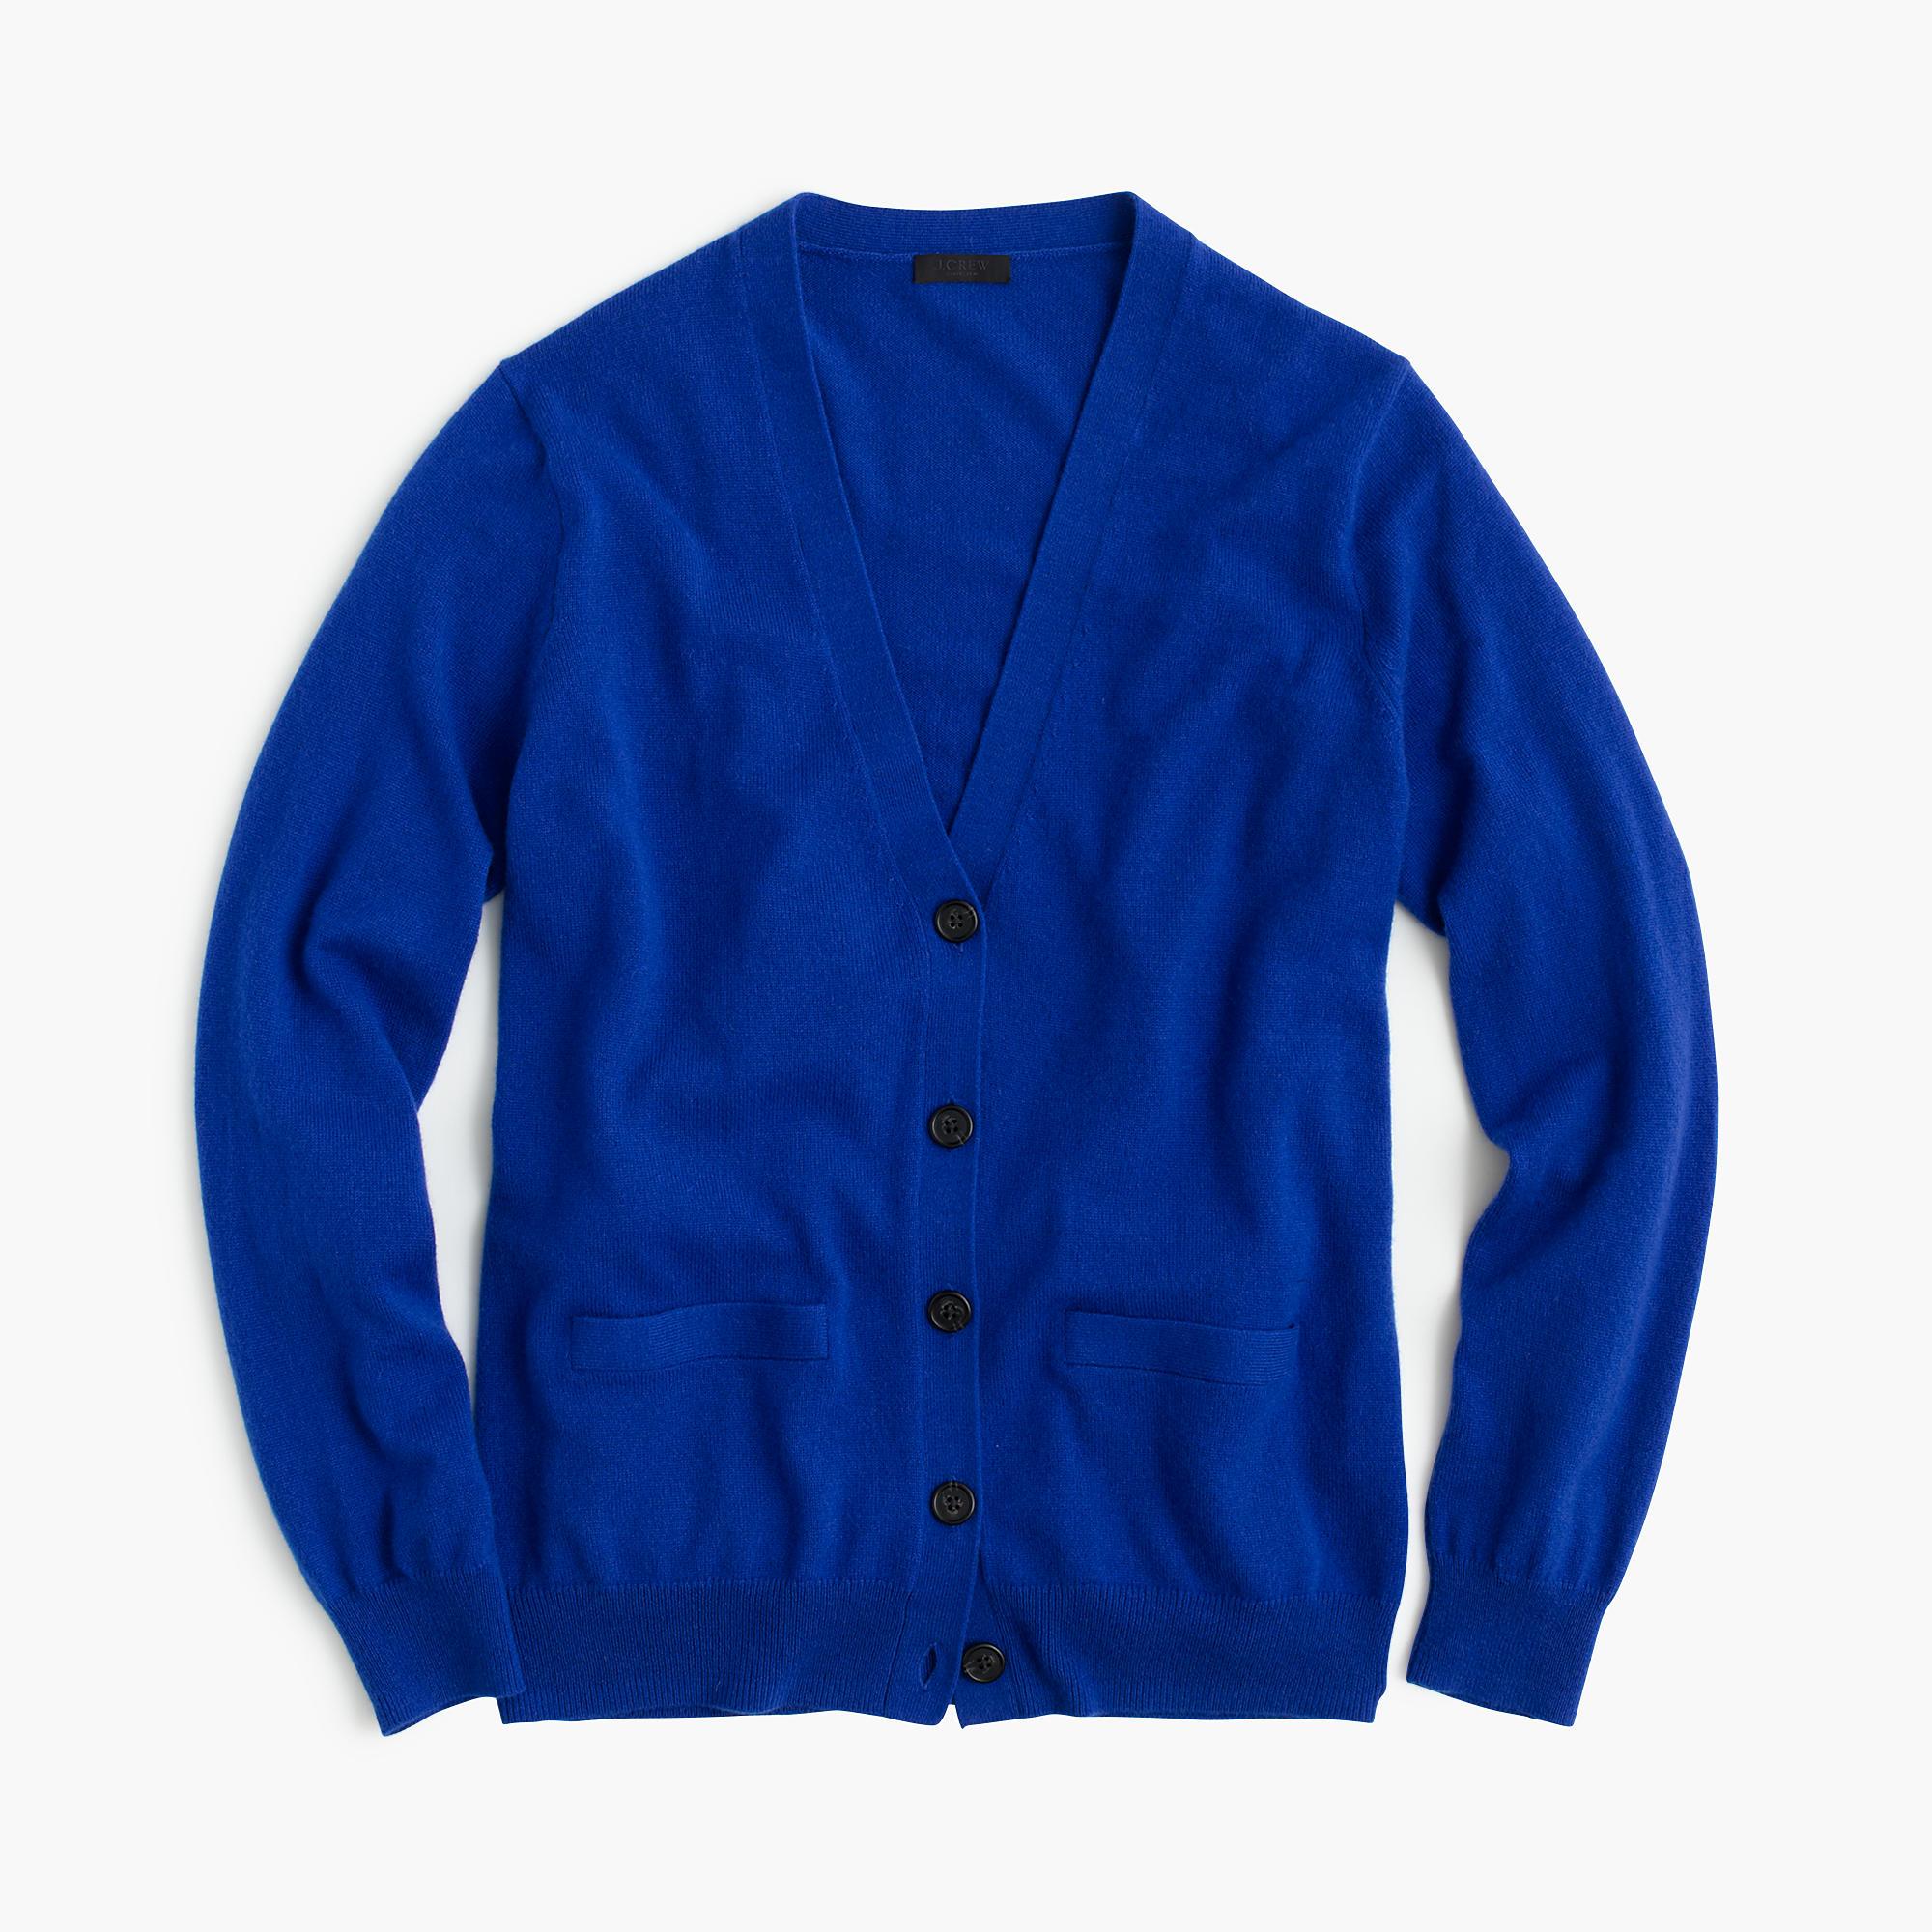 J Crew Collection Cashmere Boyfriend Cardigan Review - Cashmere ...